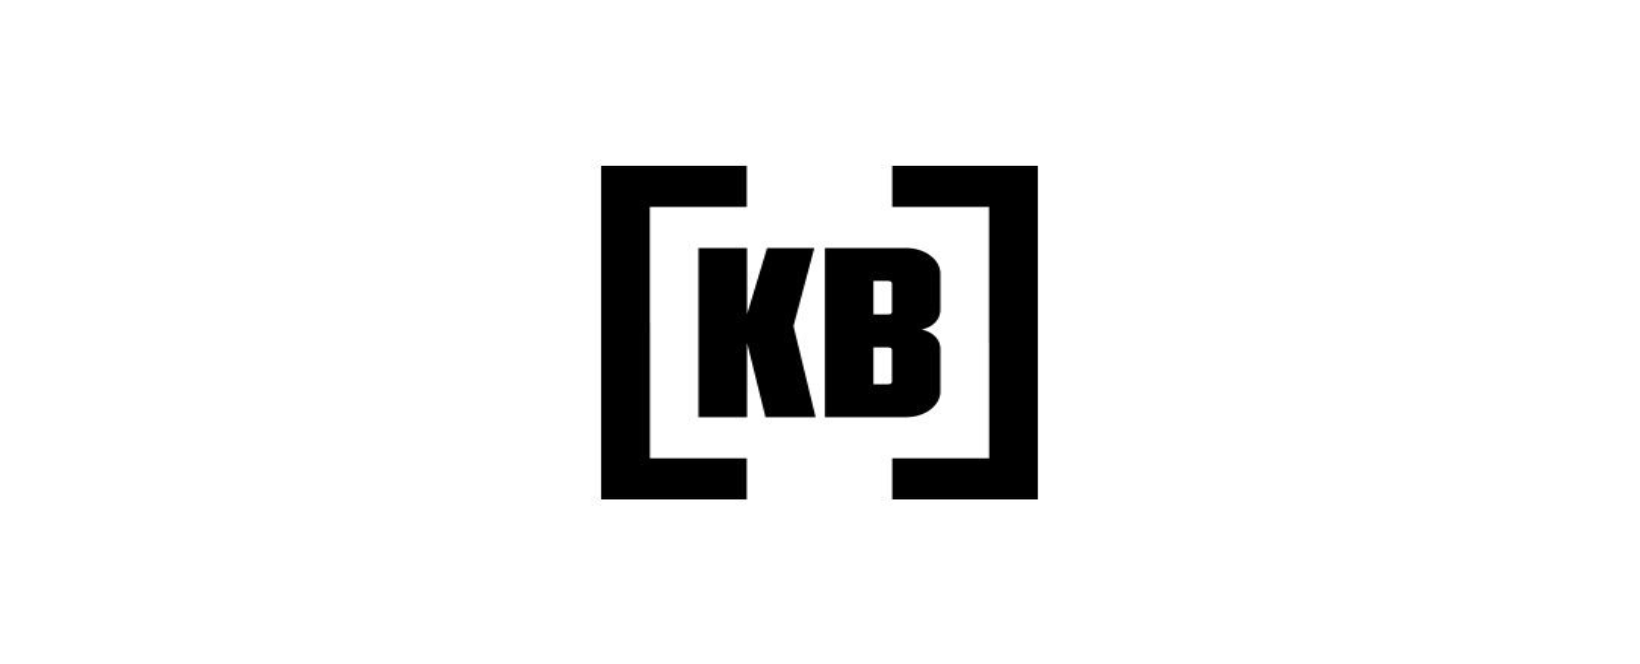 Kitbag Discount Code 2021